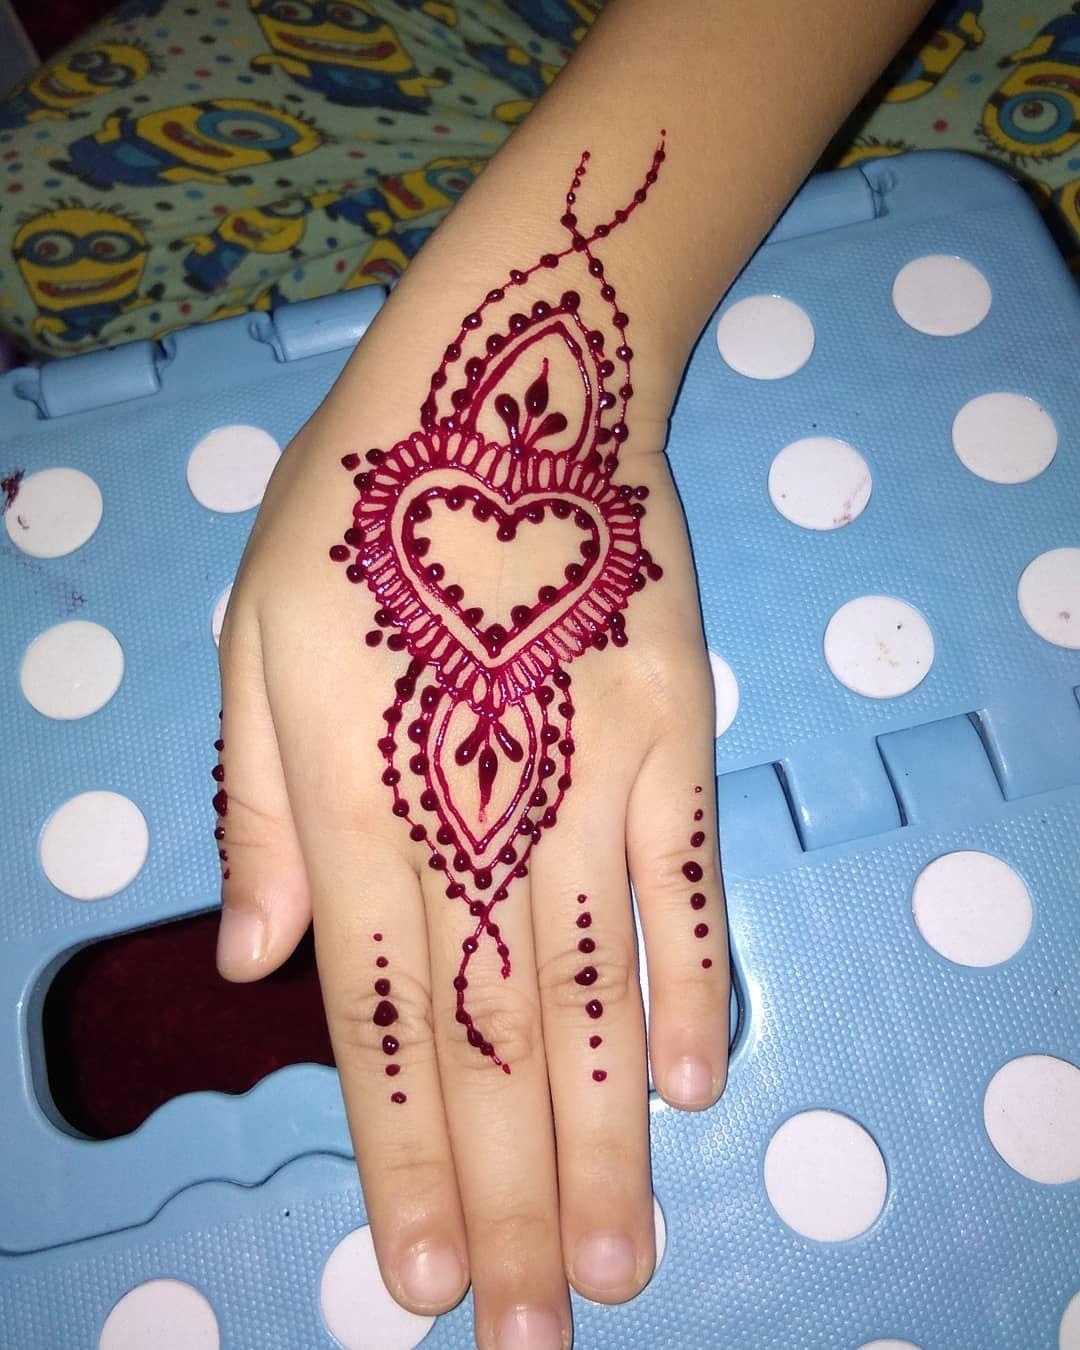 Henna By Nz Red Henna Cantik Menarik Tertarik 0178091862 0178091862